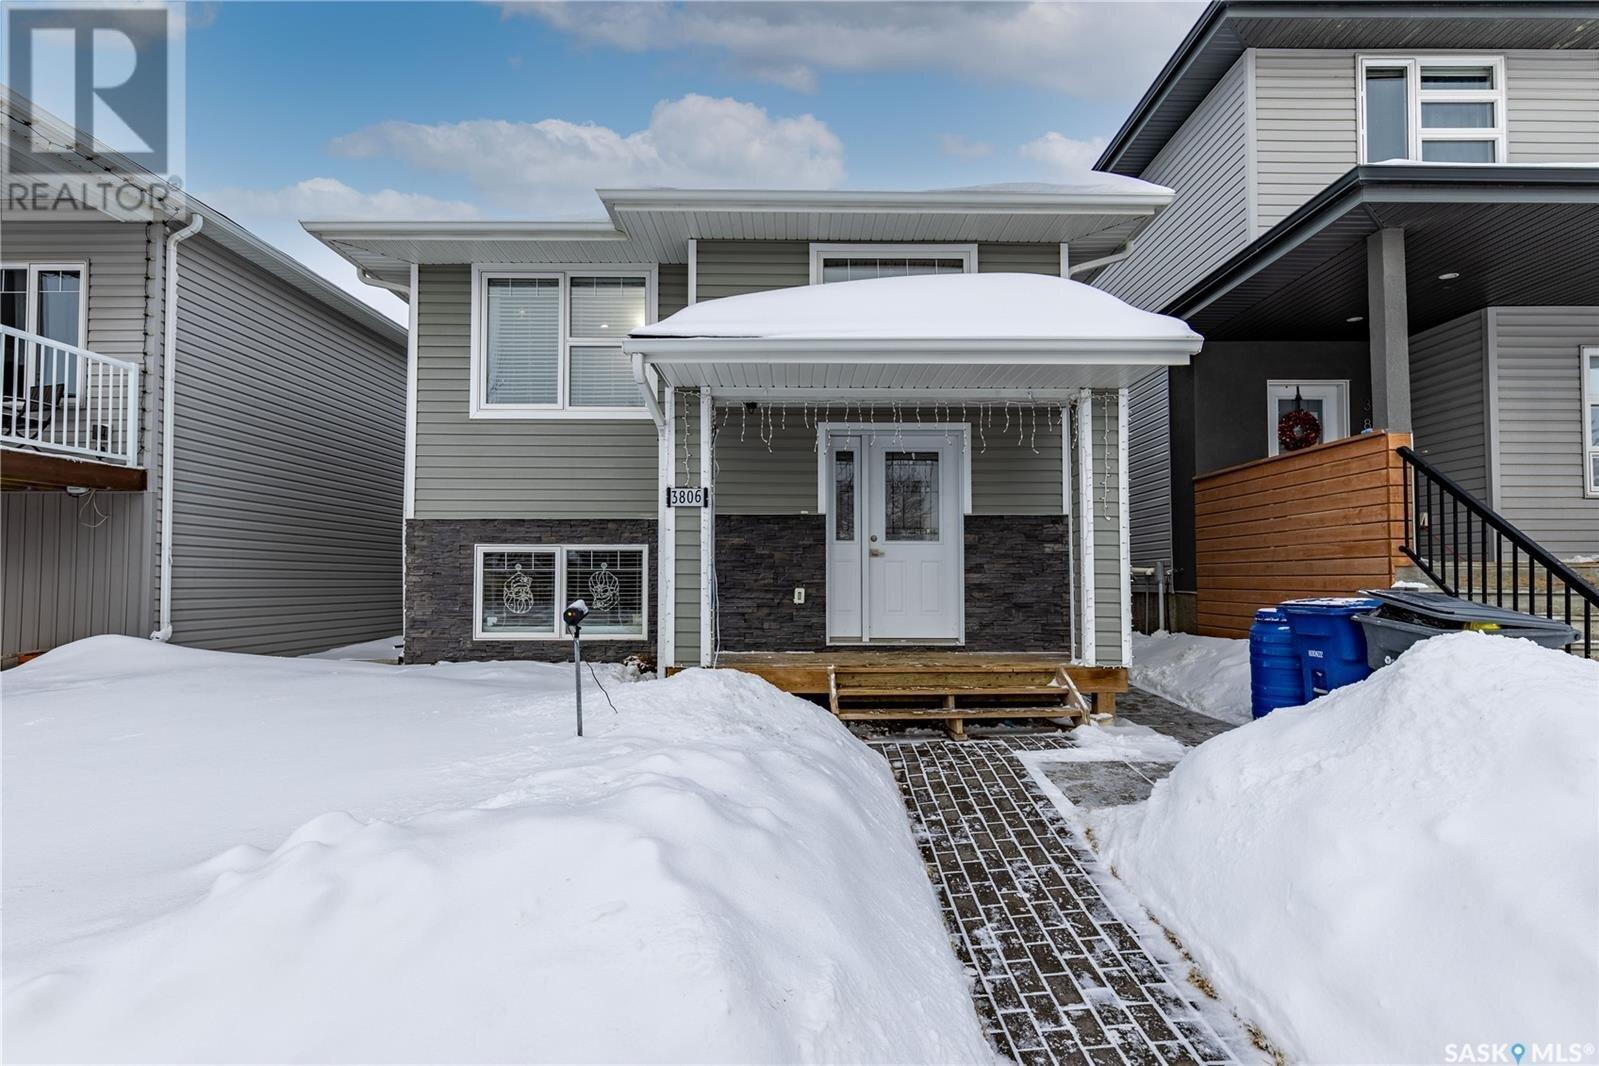 House for sale at 3806 33rd St W Saskatoon Saskatchewan - MLS: SK839531